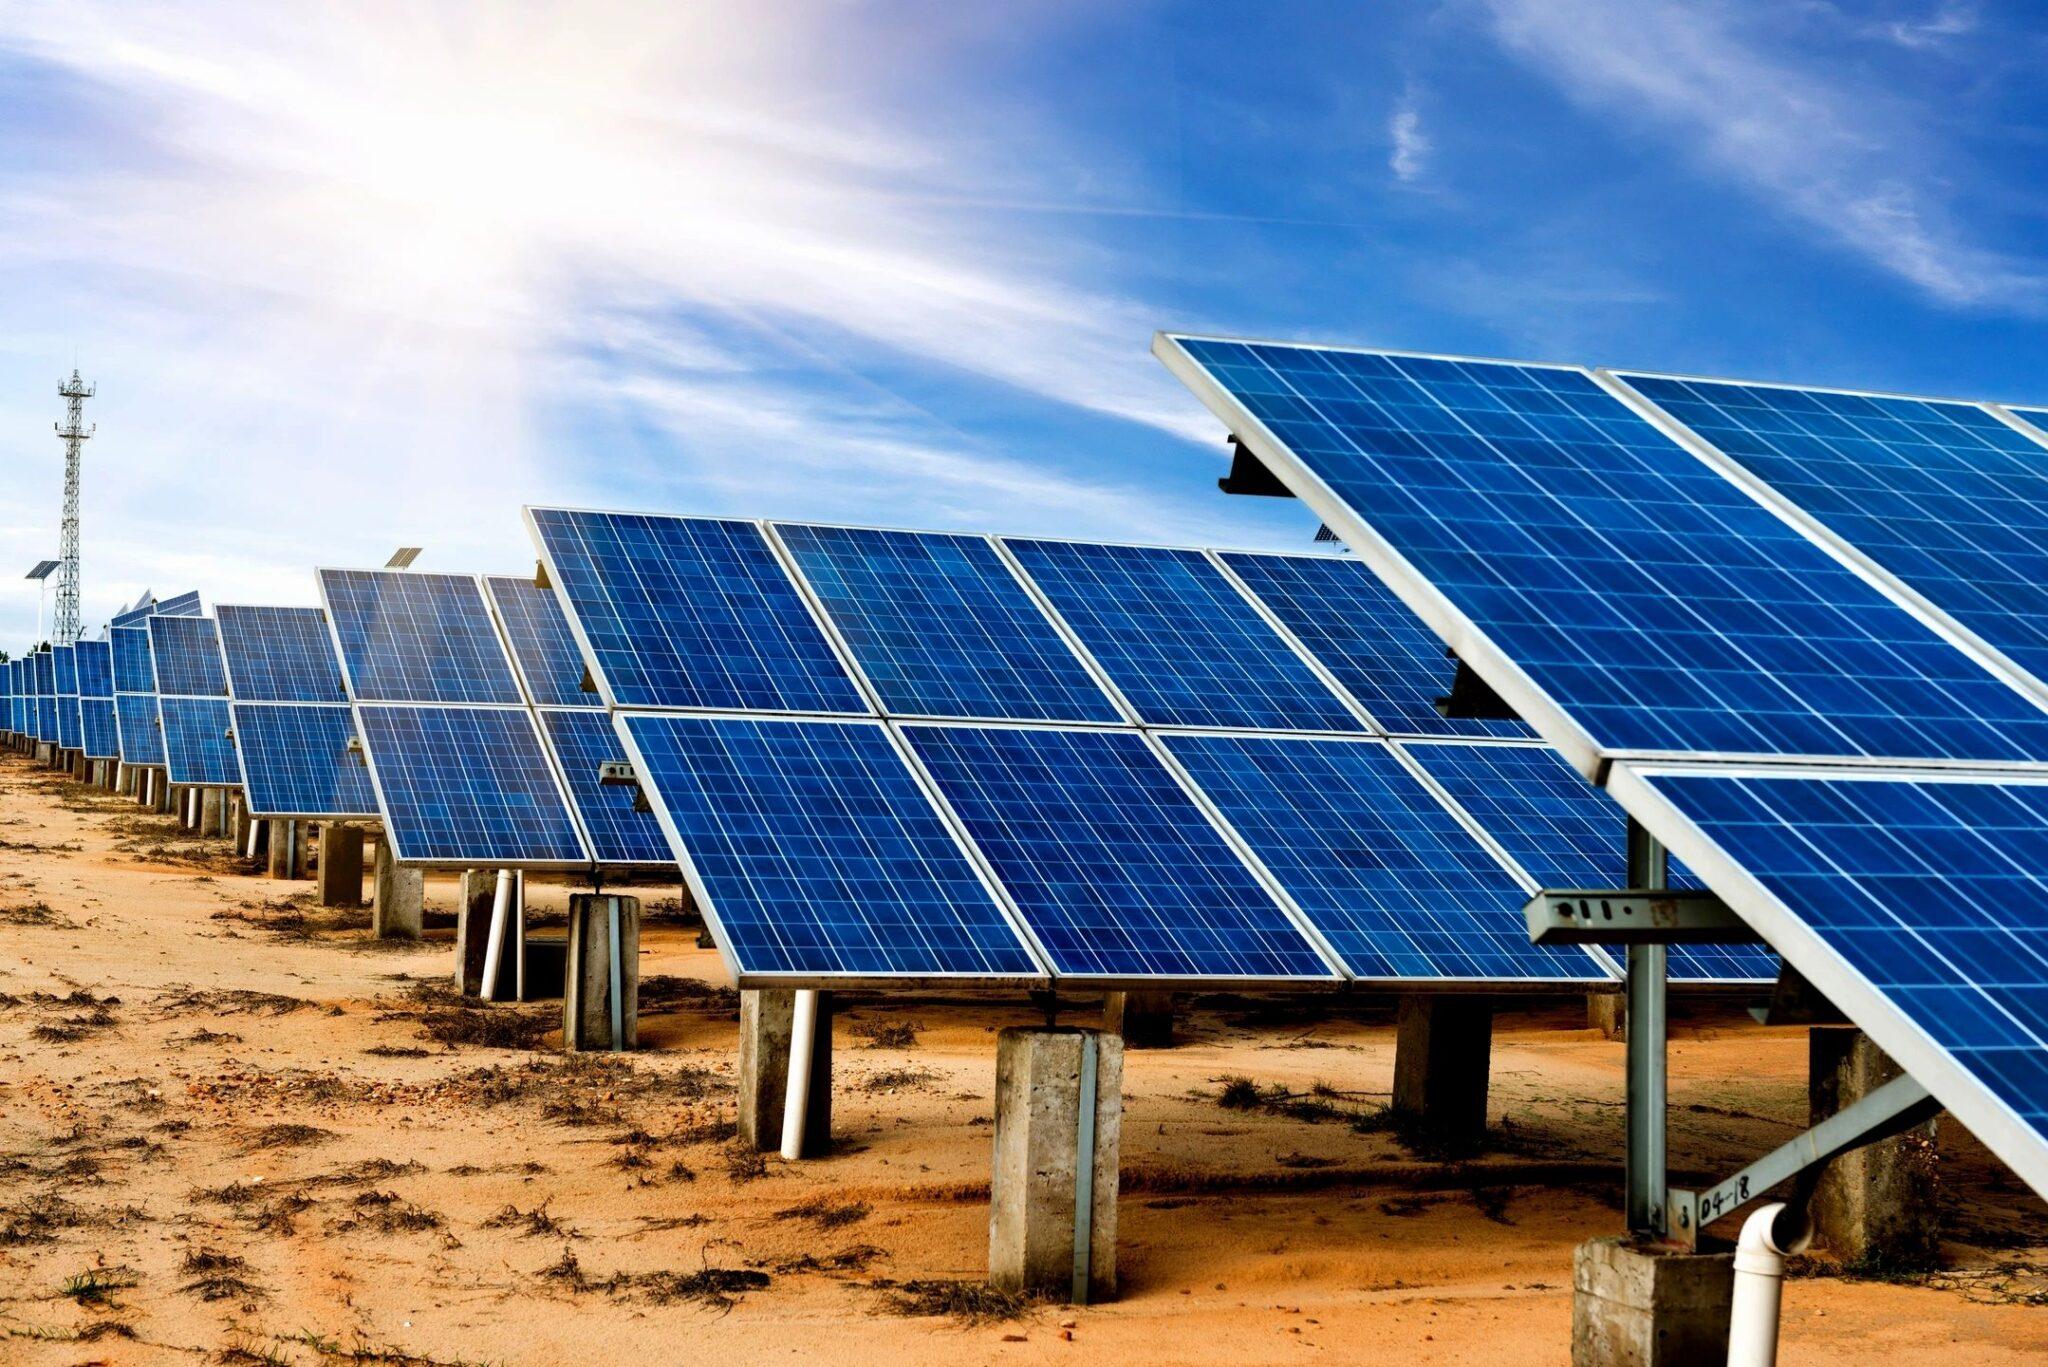 coal vs clean and renewable energy